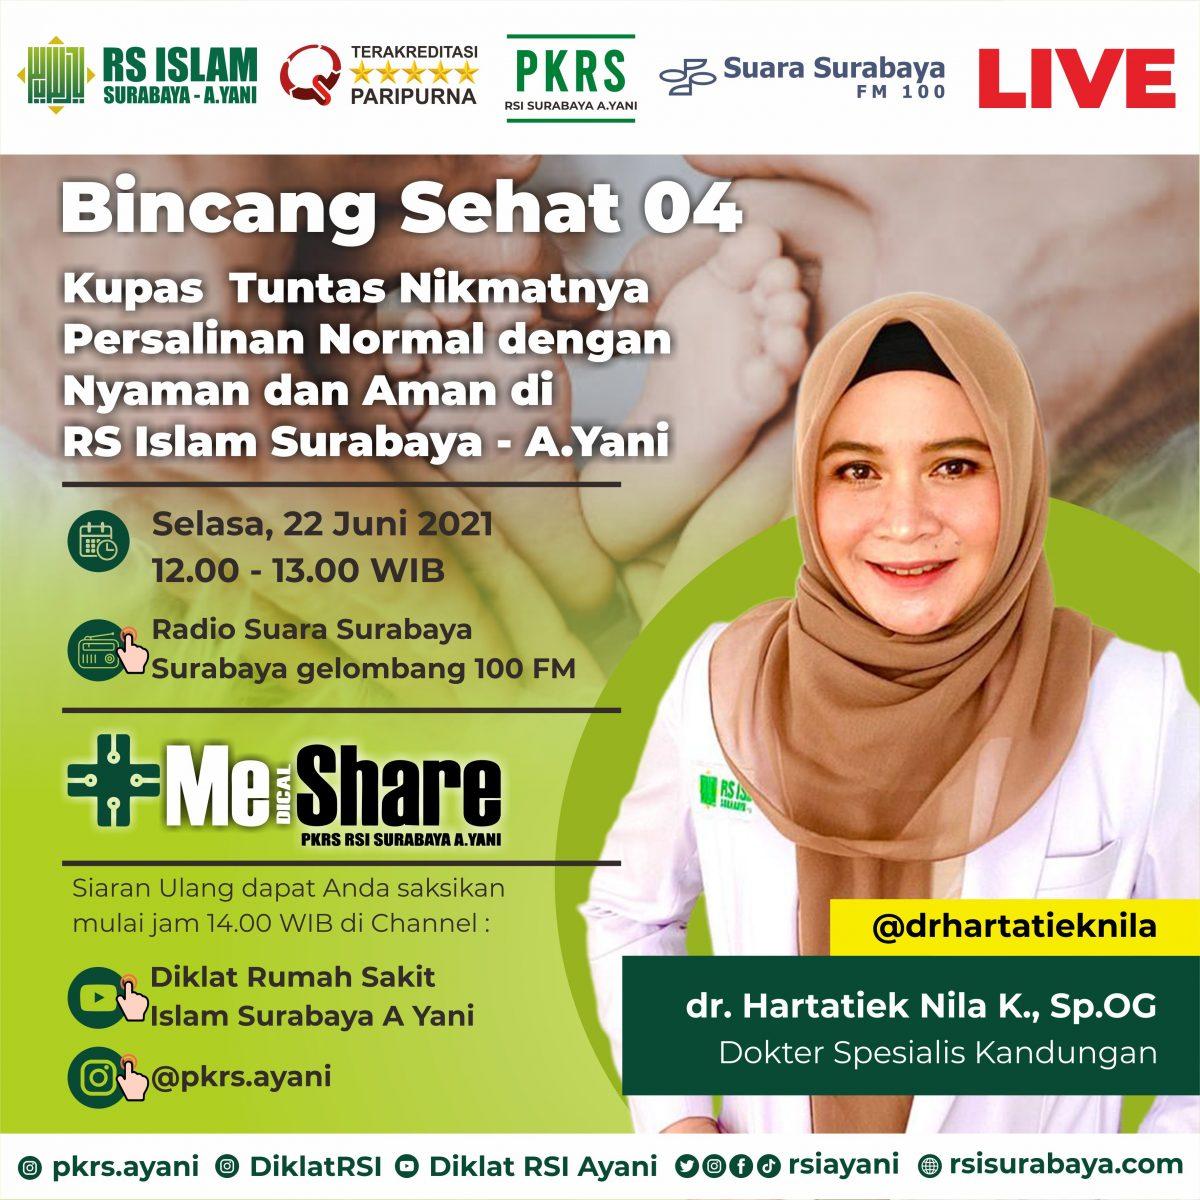 Live-Kupas-Tuntas-Nikmatnya-Persalinan-Normal-dengan-Aman-dan-Nyaman-di-RS-Islam-Surabaya-A-Yani-1200x1200.jpg